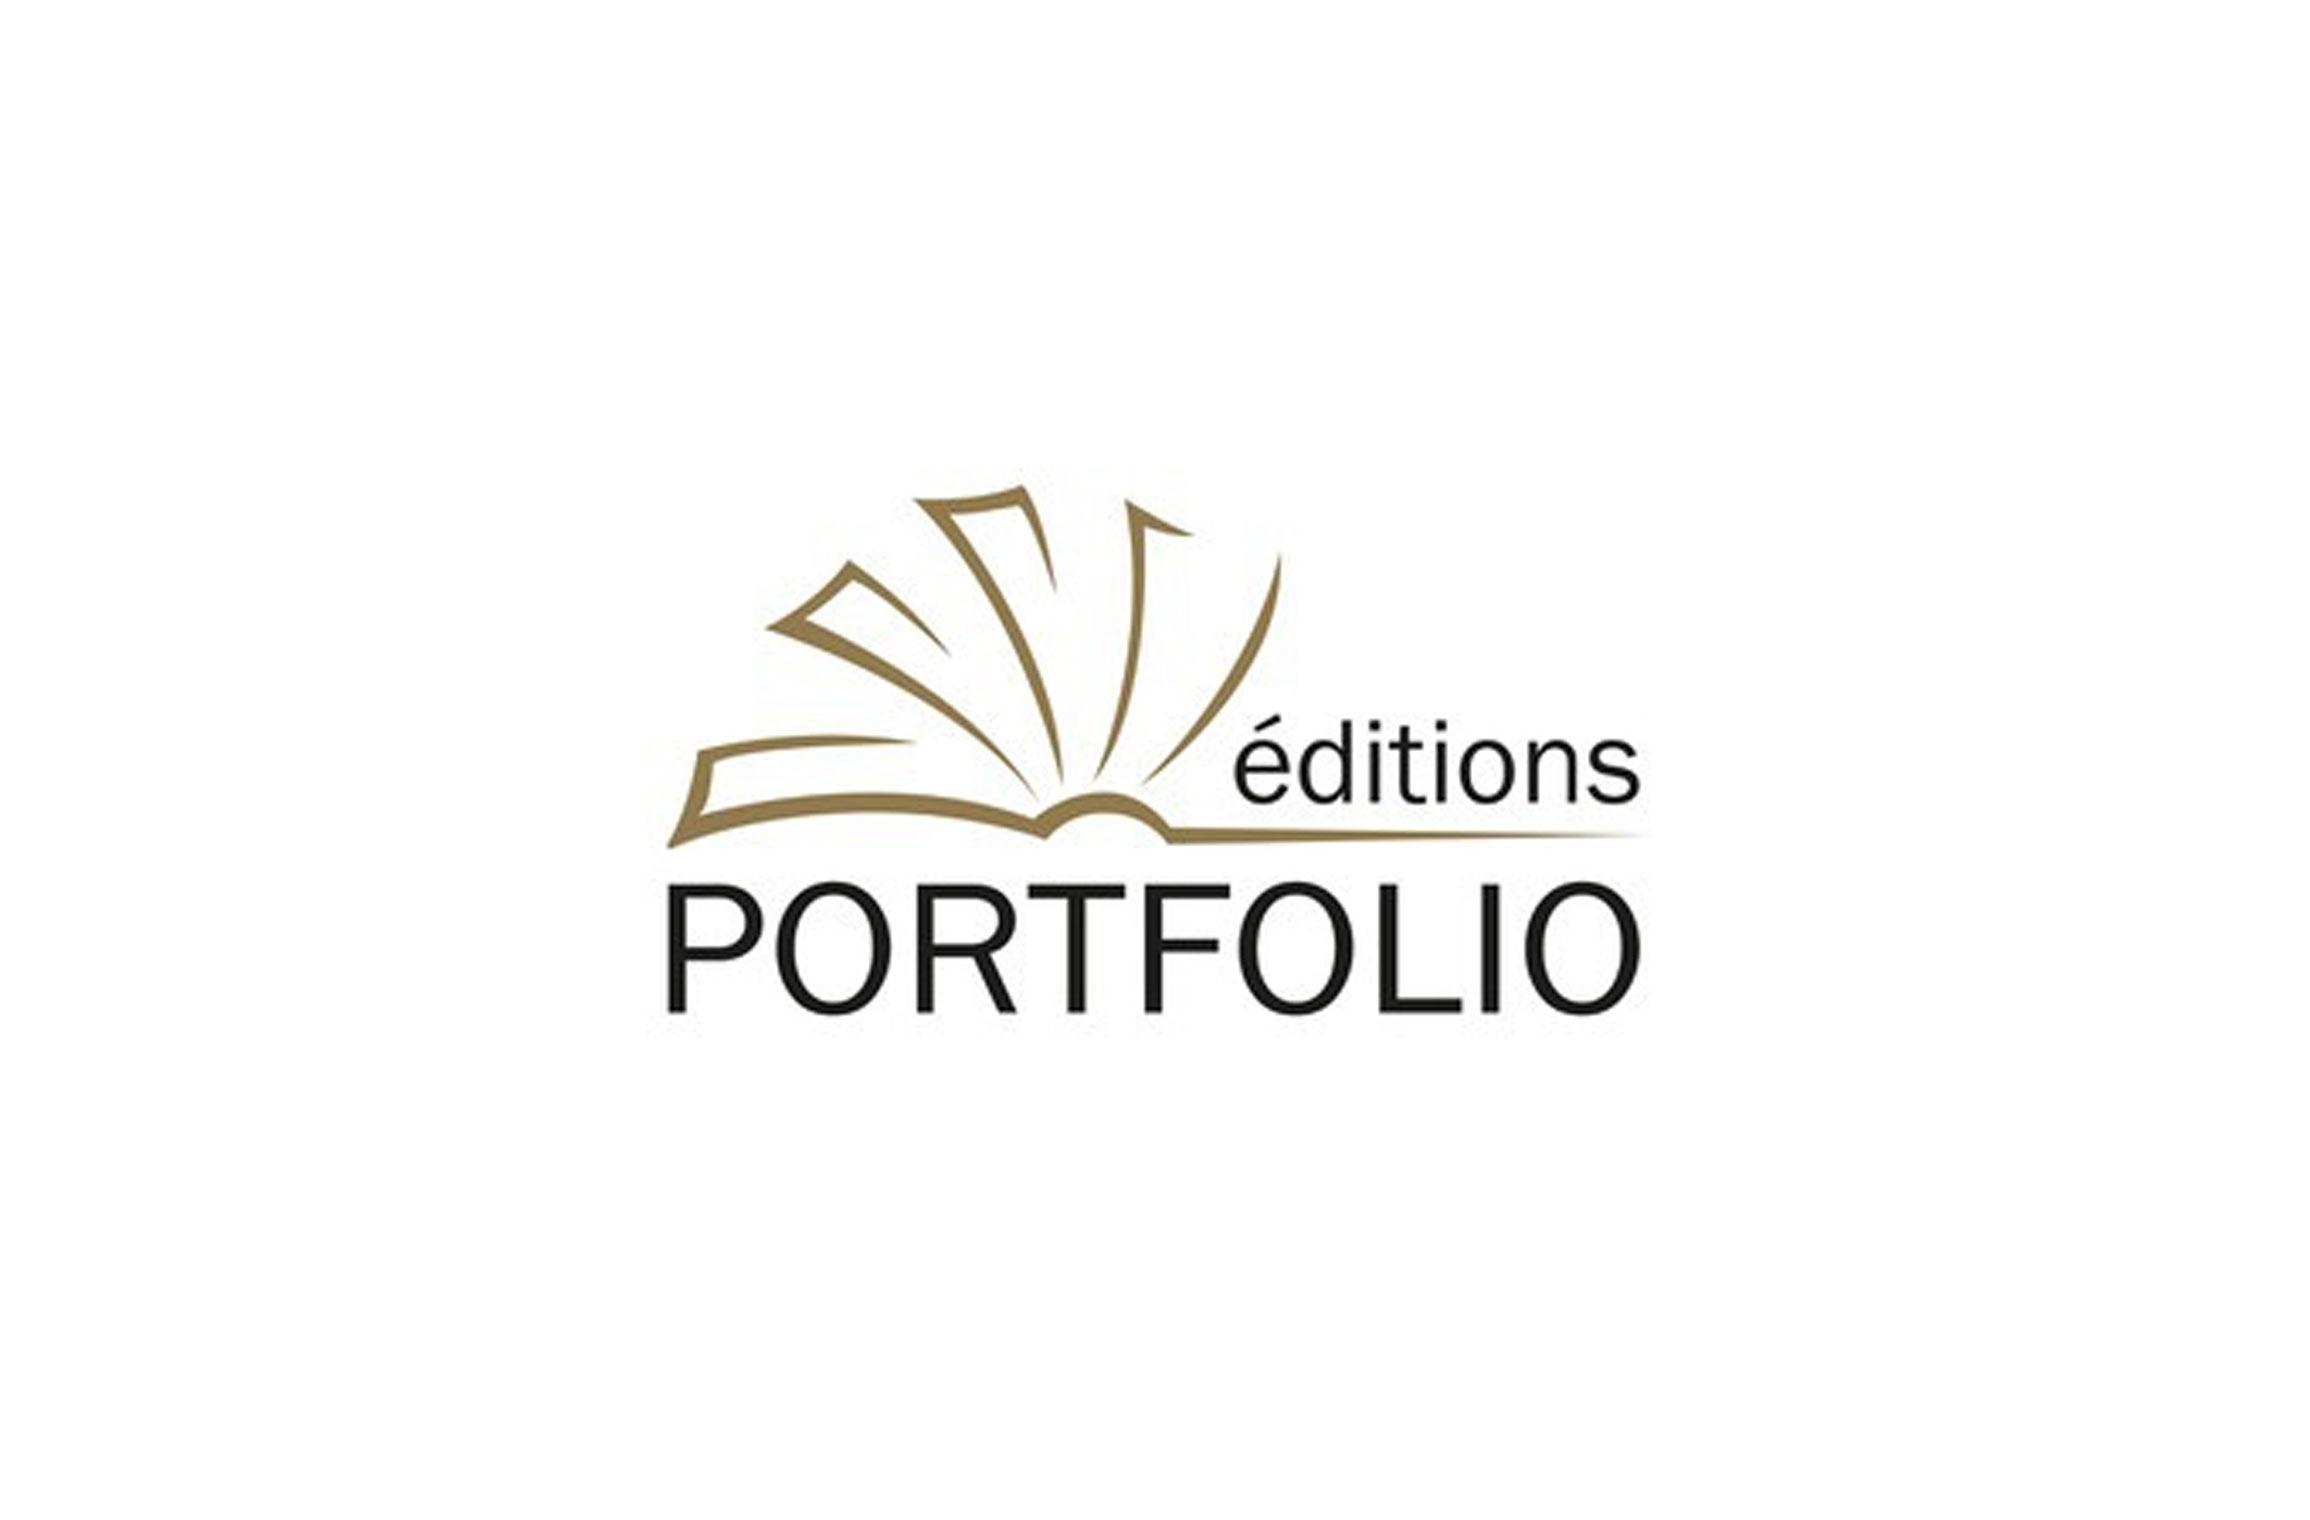 Editions Portfolio